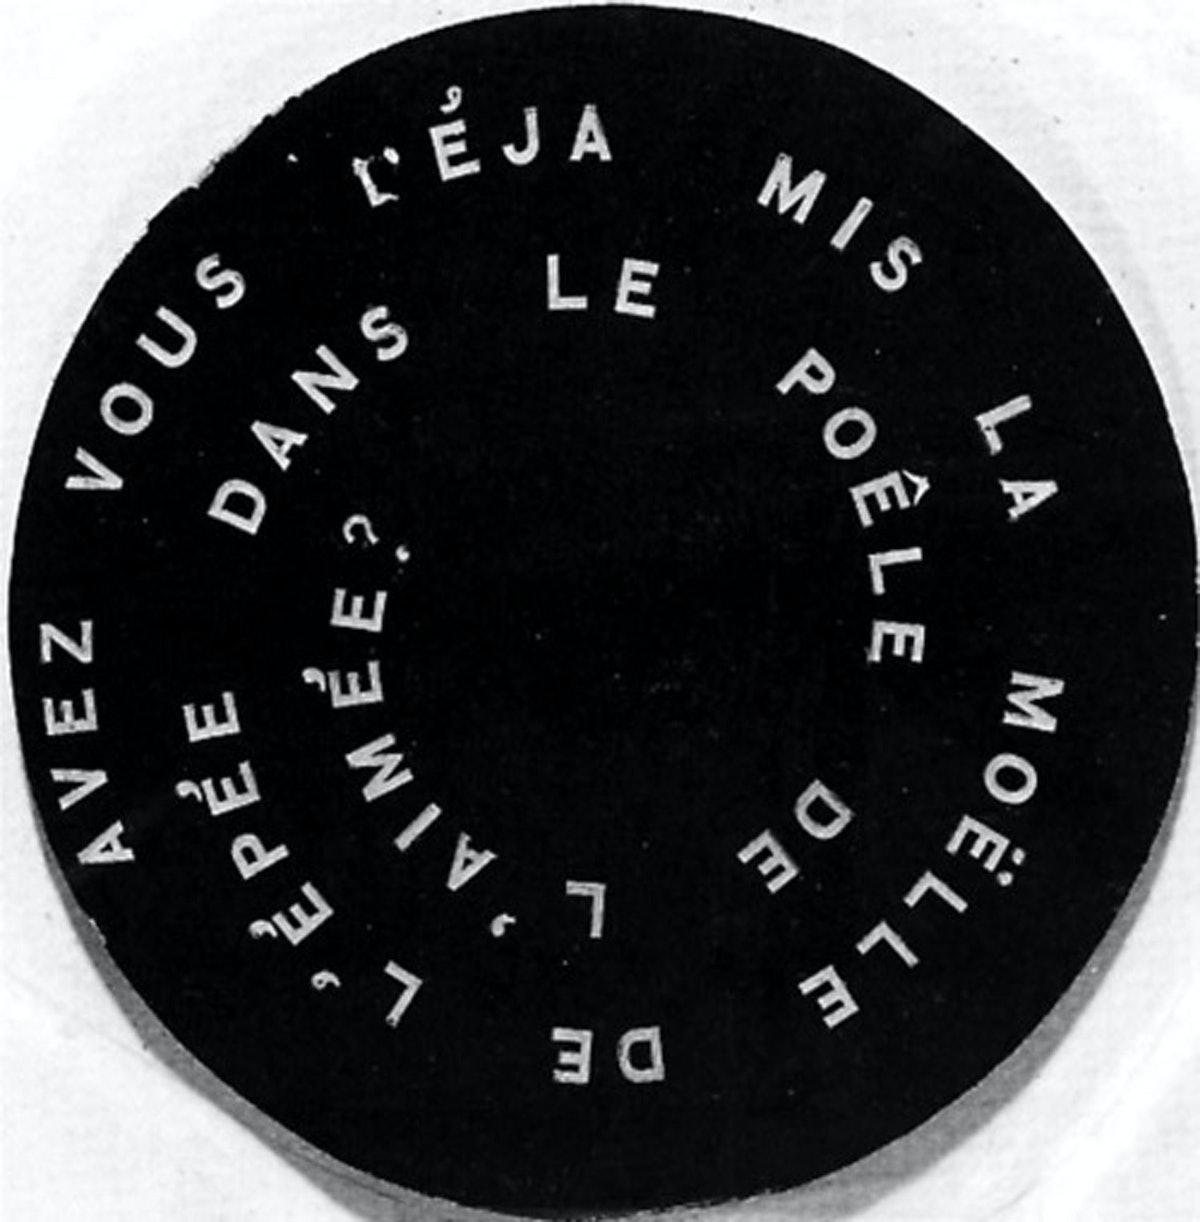 Marcel Duchamp's Anemic Cinema